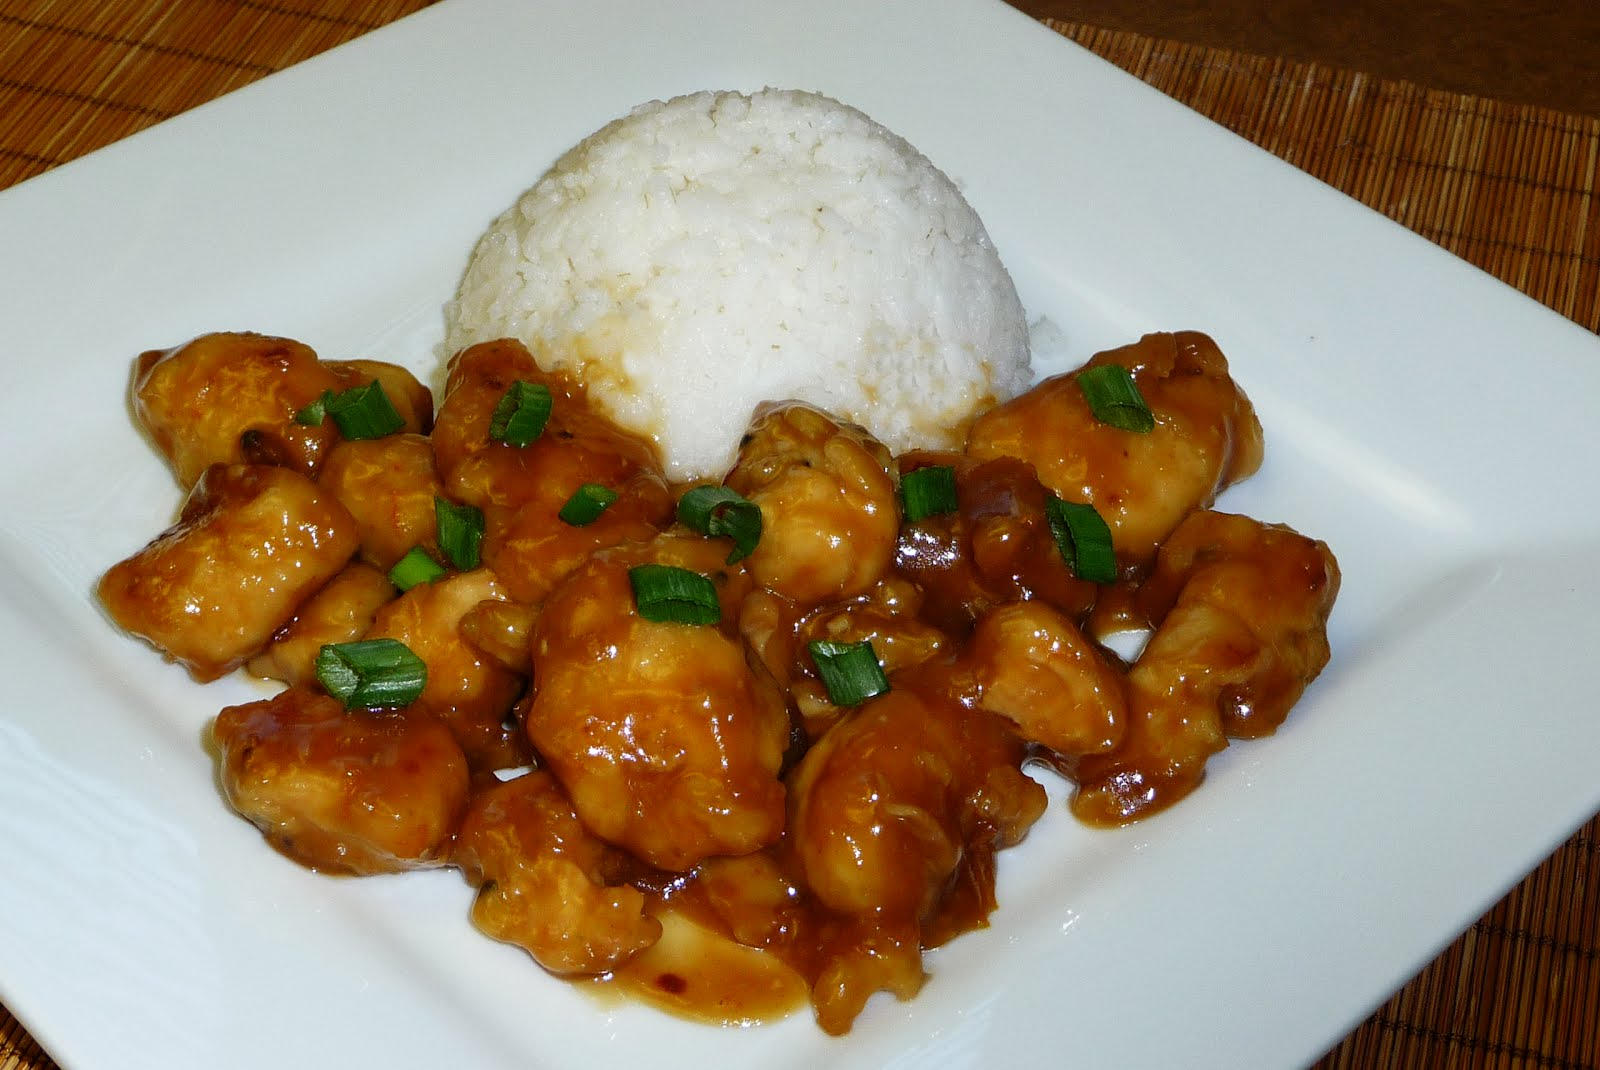 Pollo a la naranja estilo chino cocina facil for Pescado chino